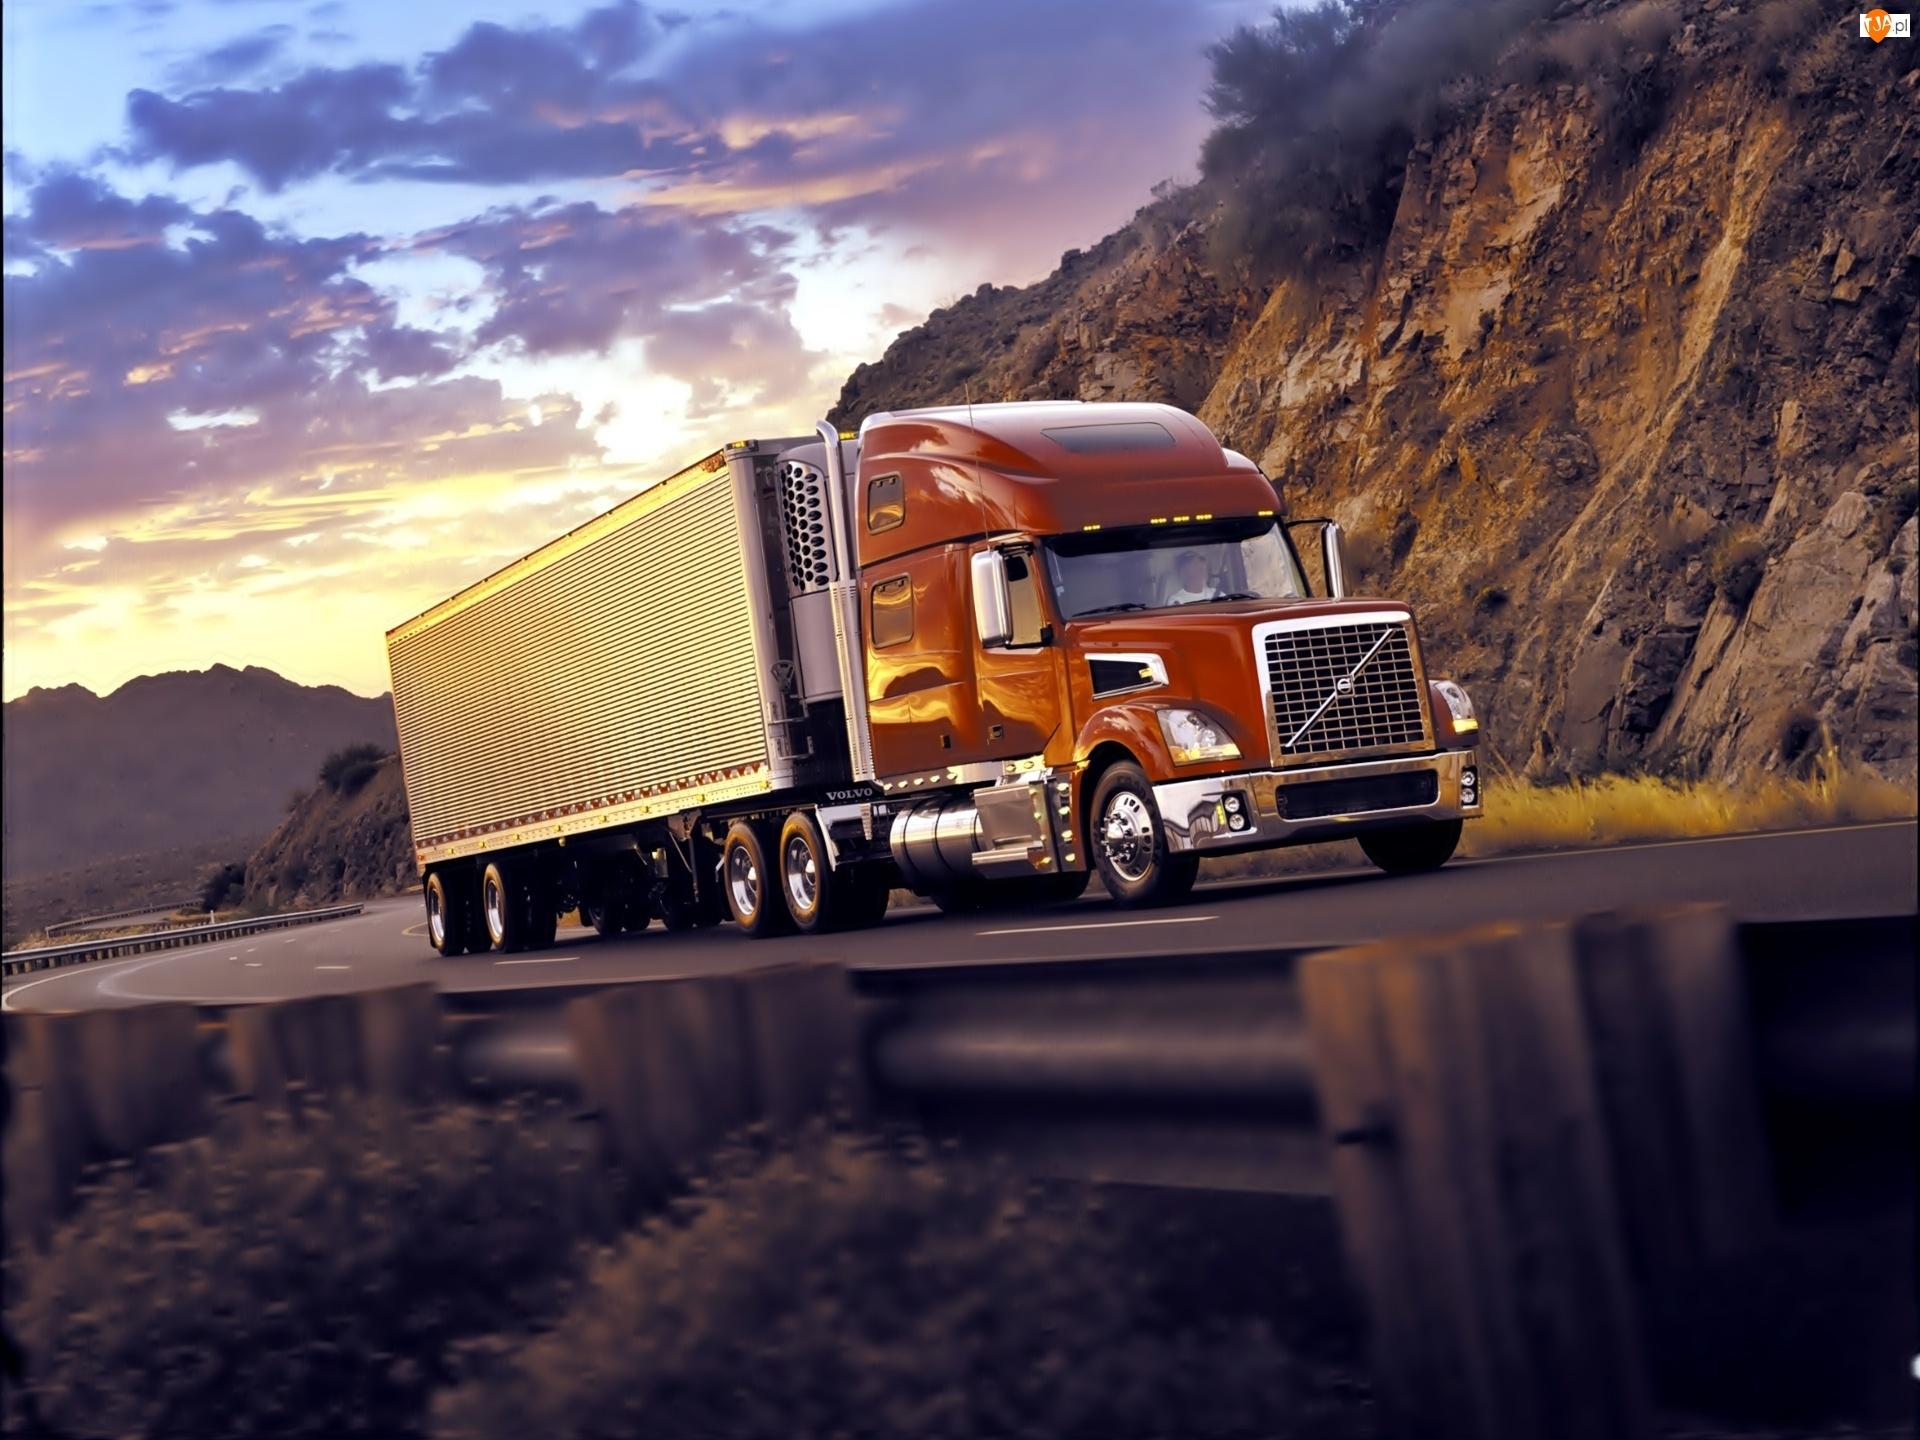 Ciężarówka, Skały, Volvo, Droga